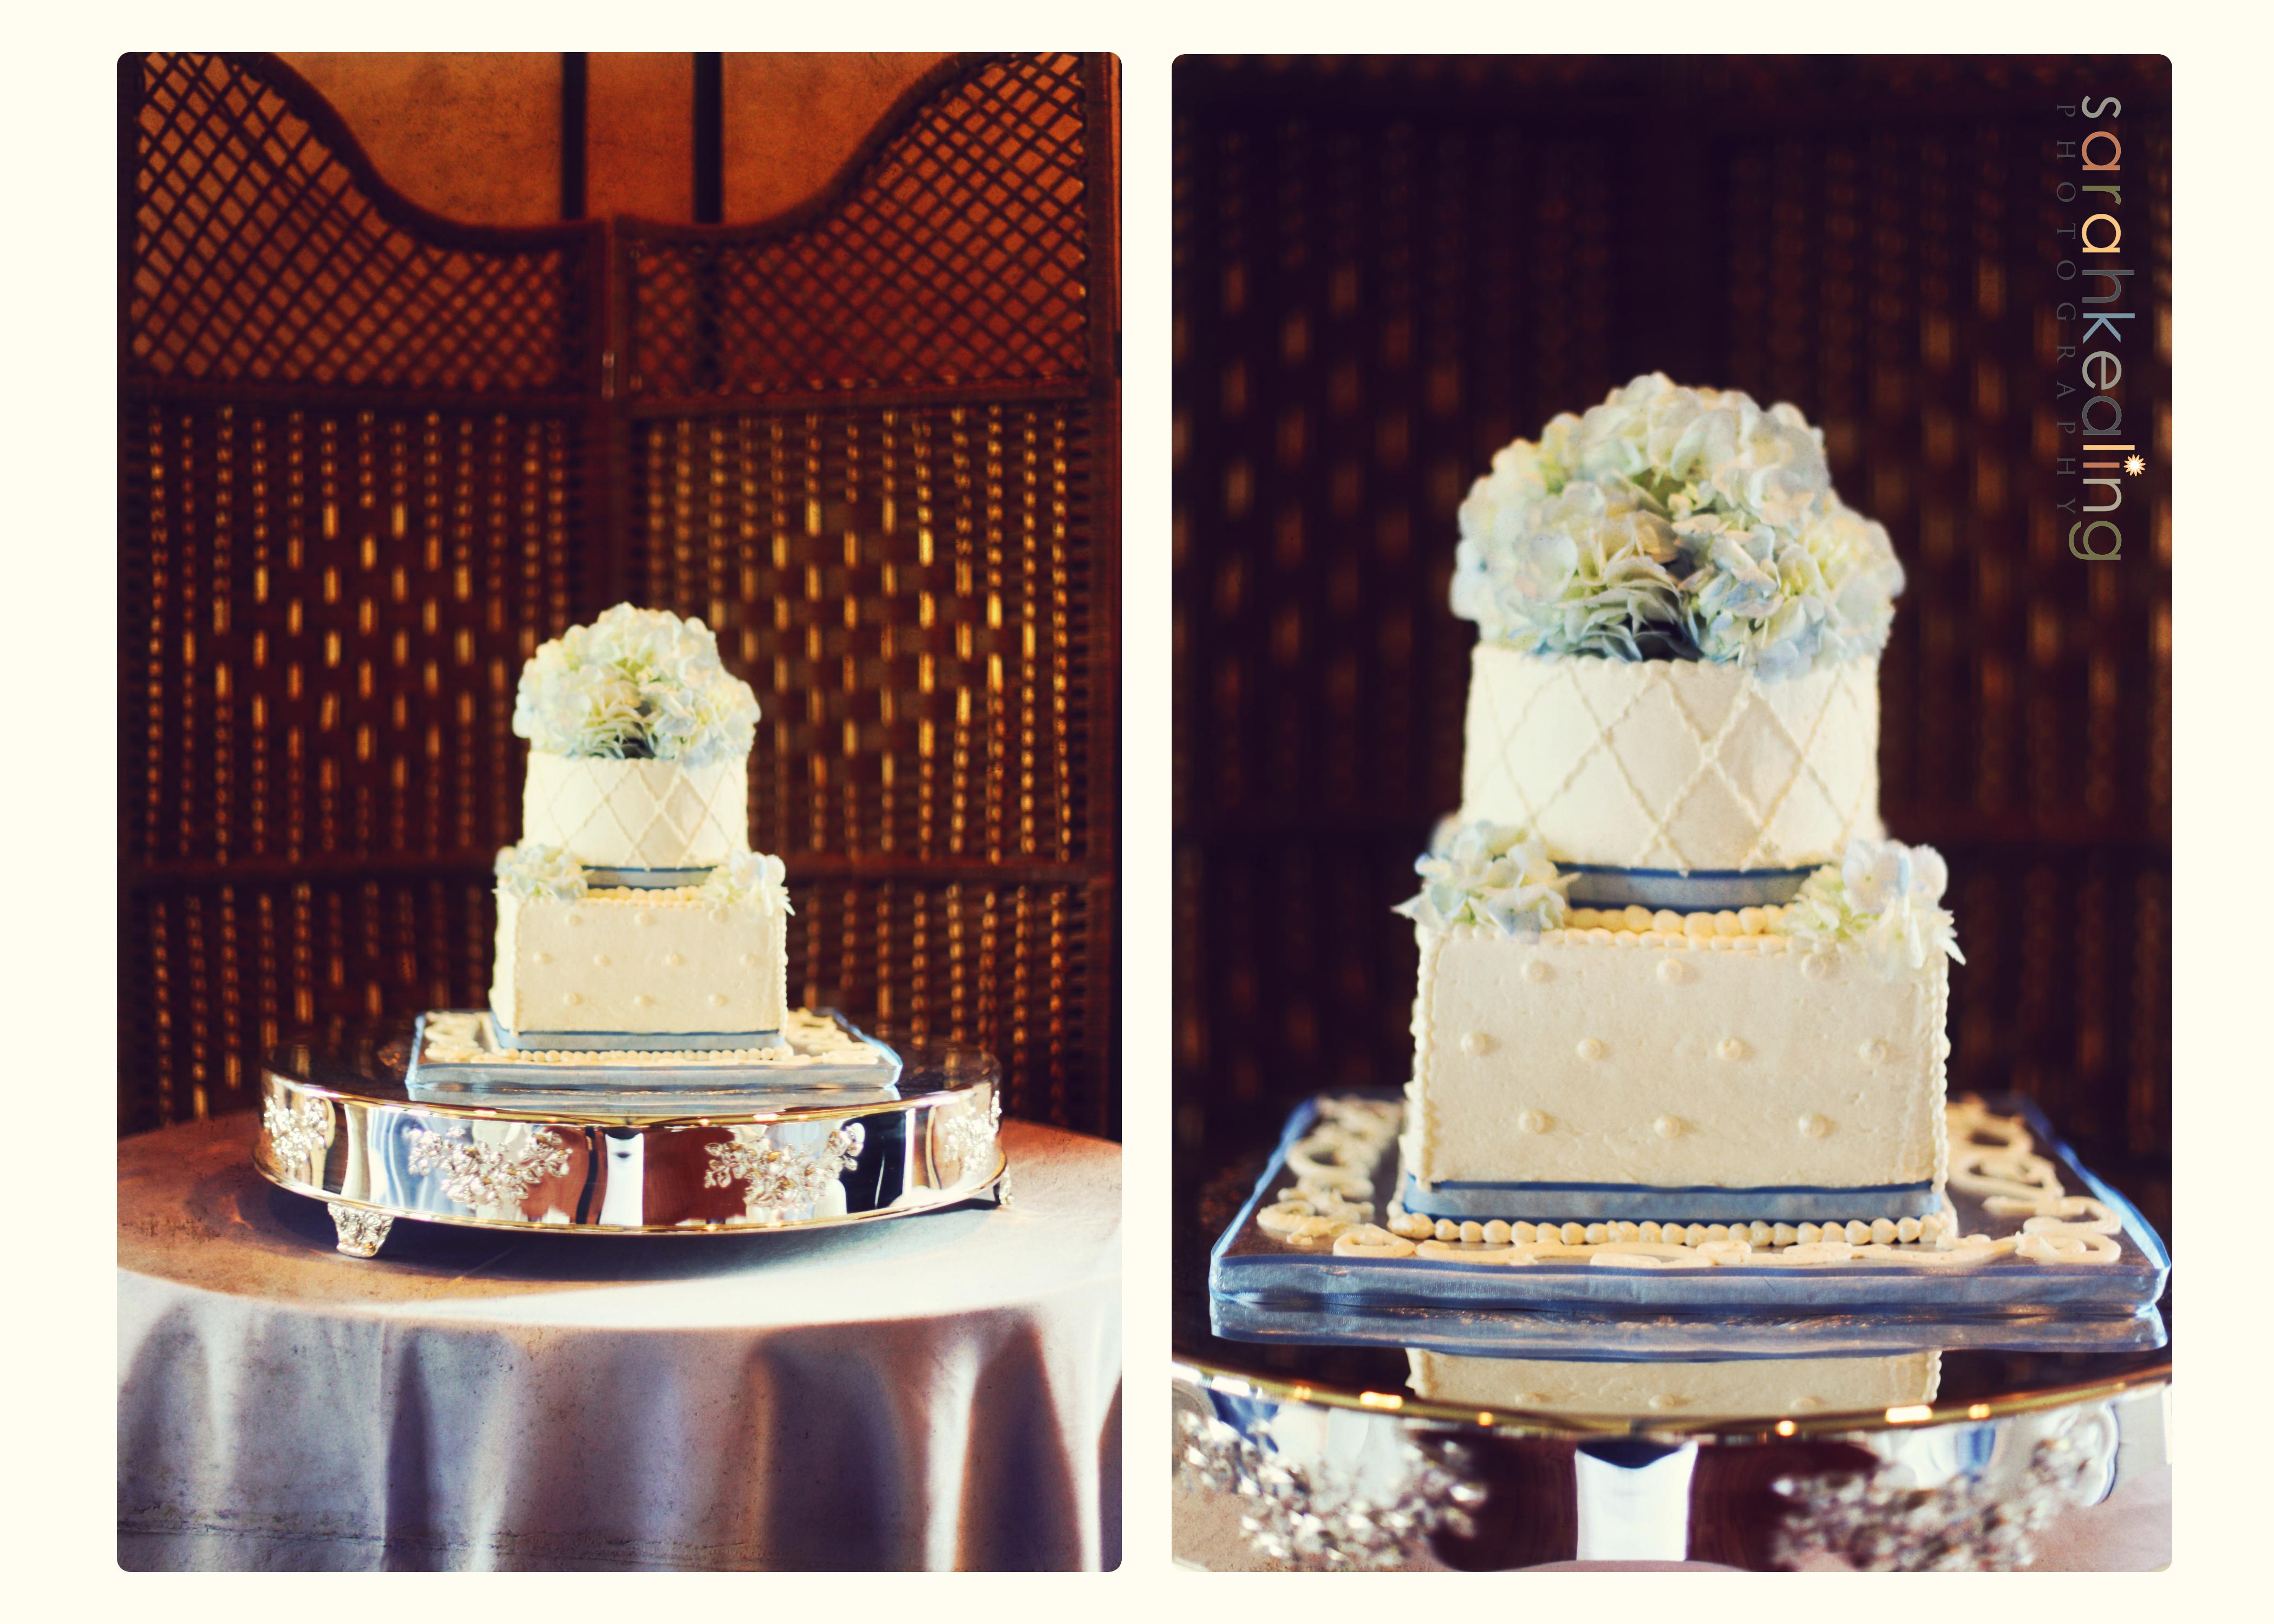 Cakes, white, purple, blue, cake, Sarah kealing photography